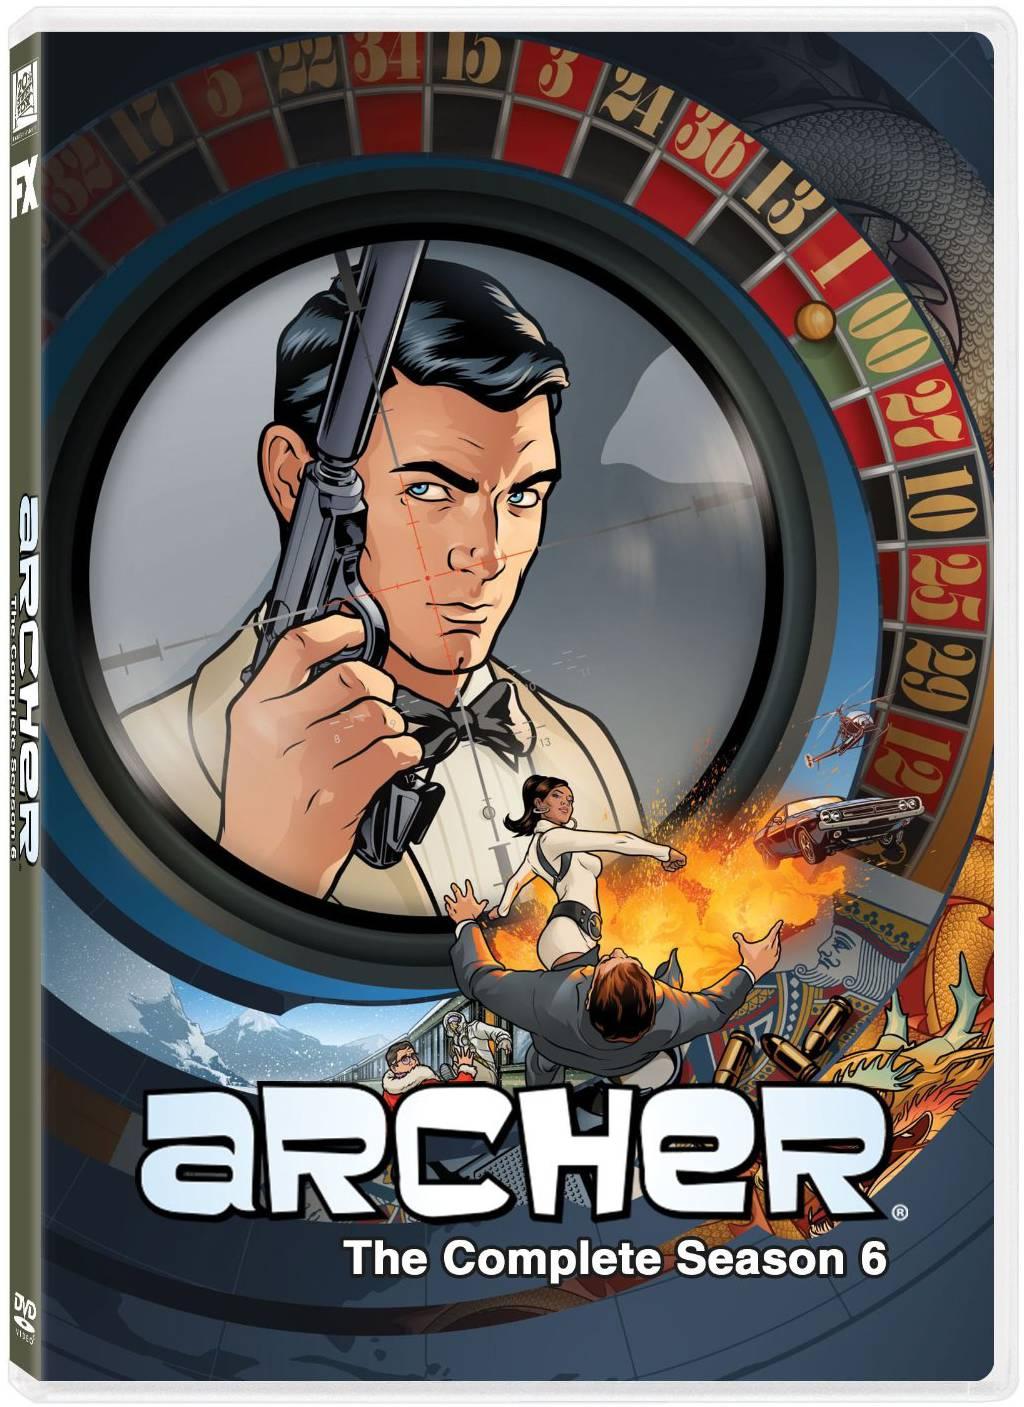 Archer The Complete Season Six Dvd Review Archer